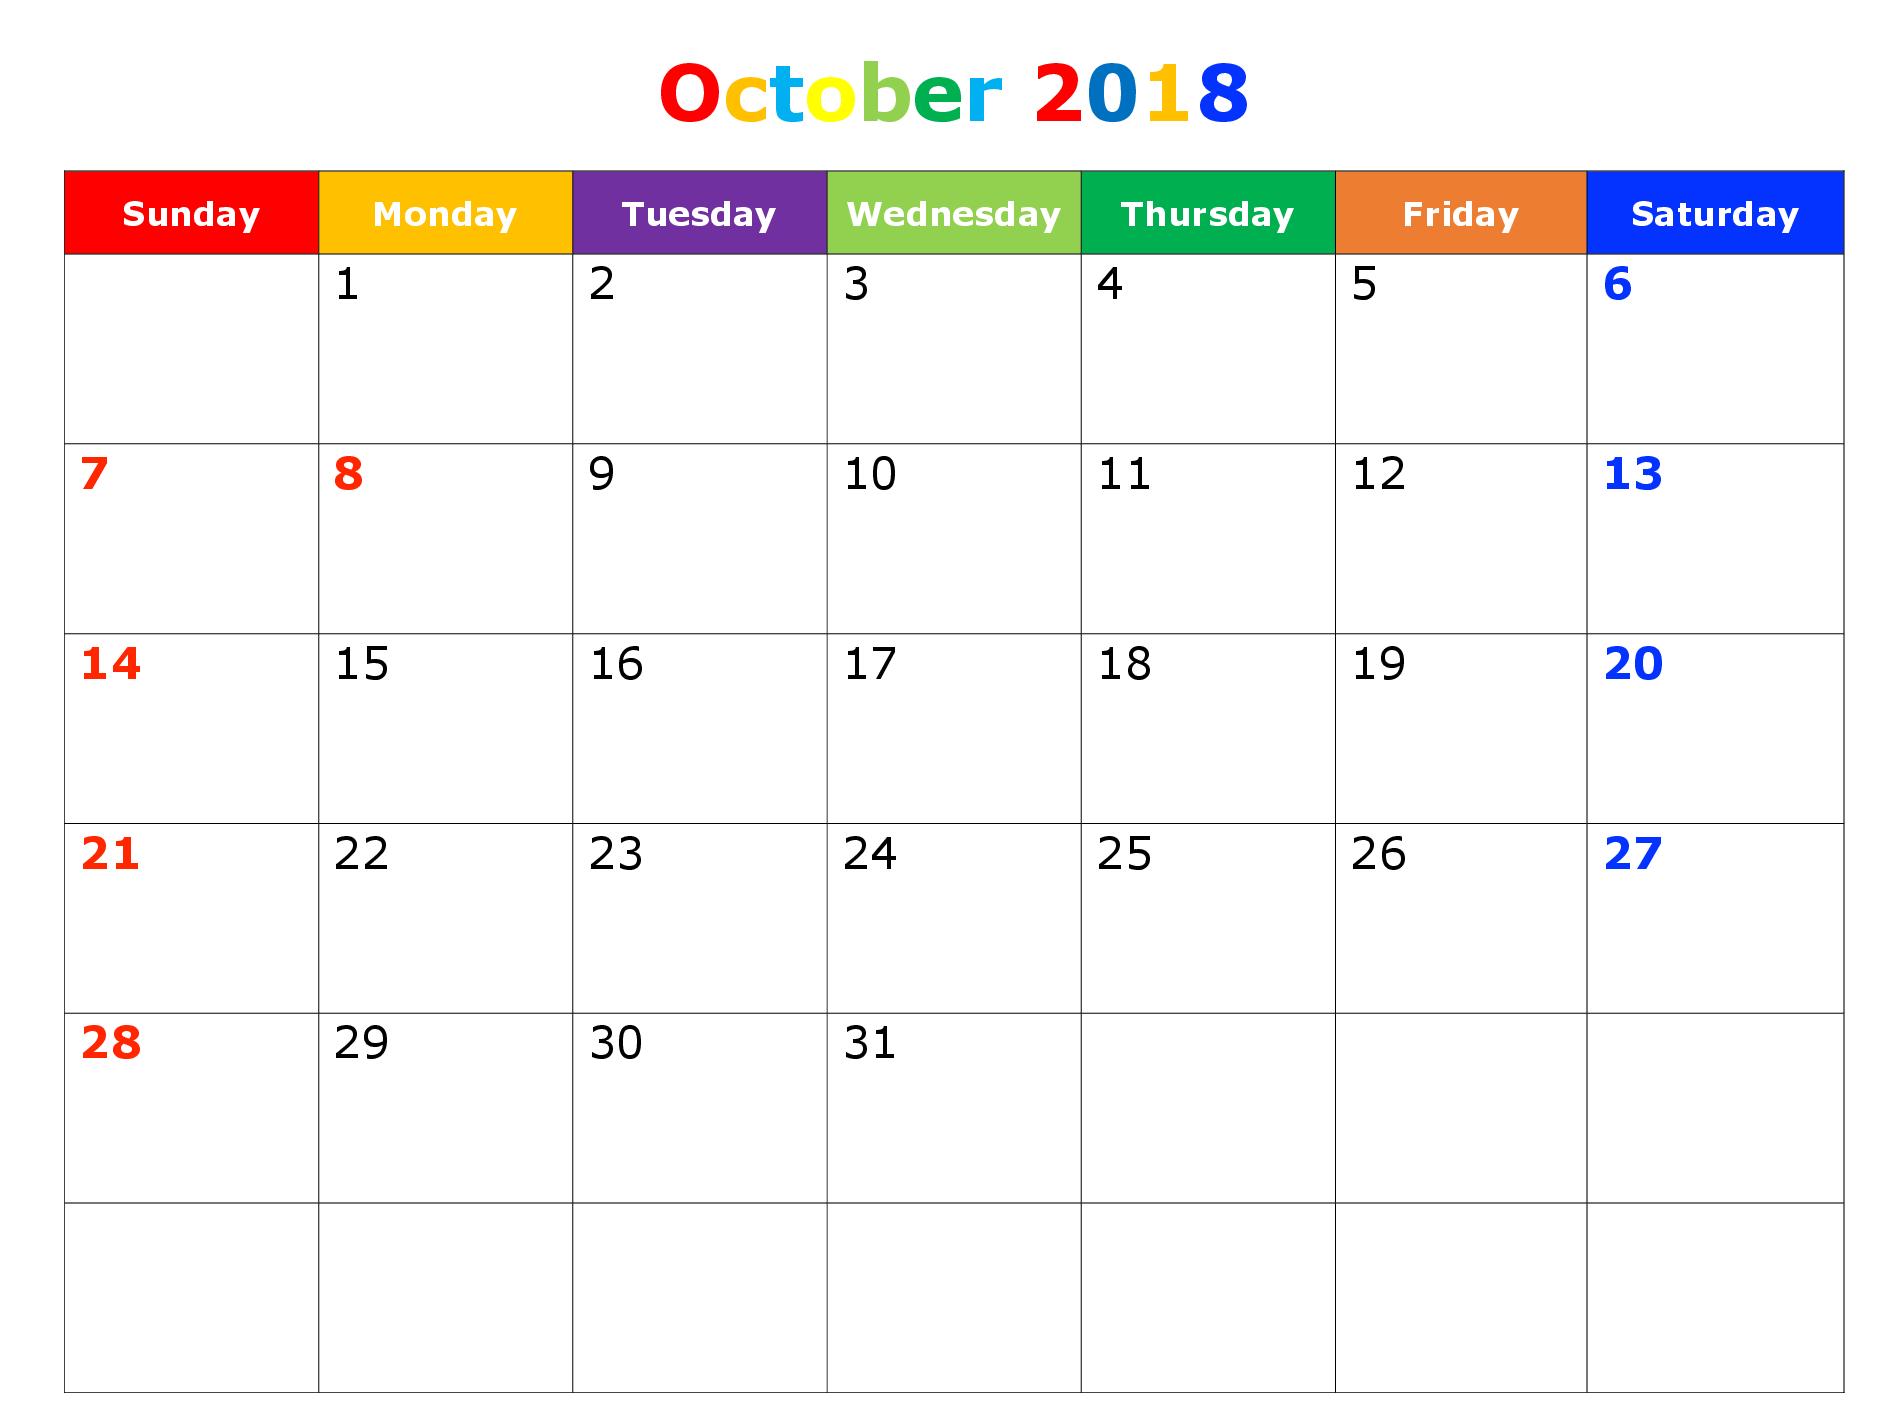 October 2018 Printable Calendar Blank Templates Free Download pertaining to October Calendar Printable Template